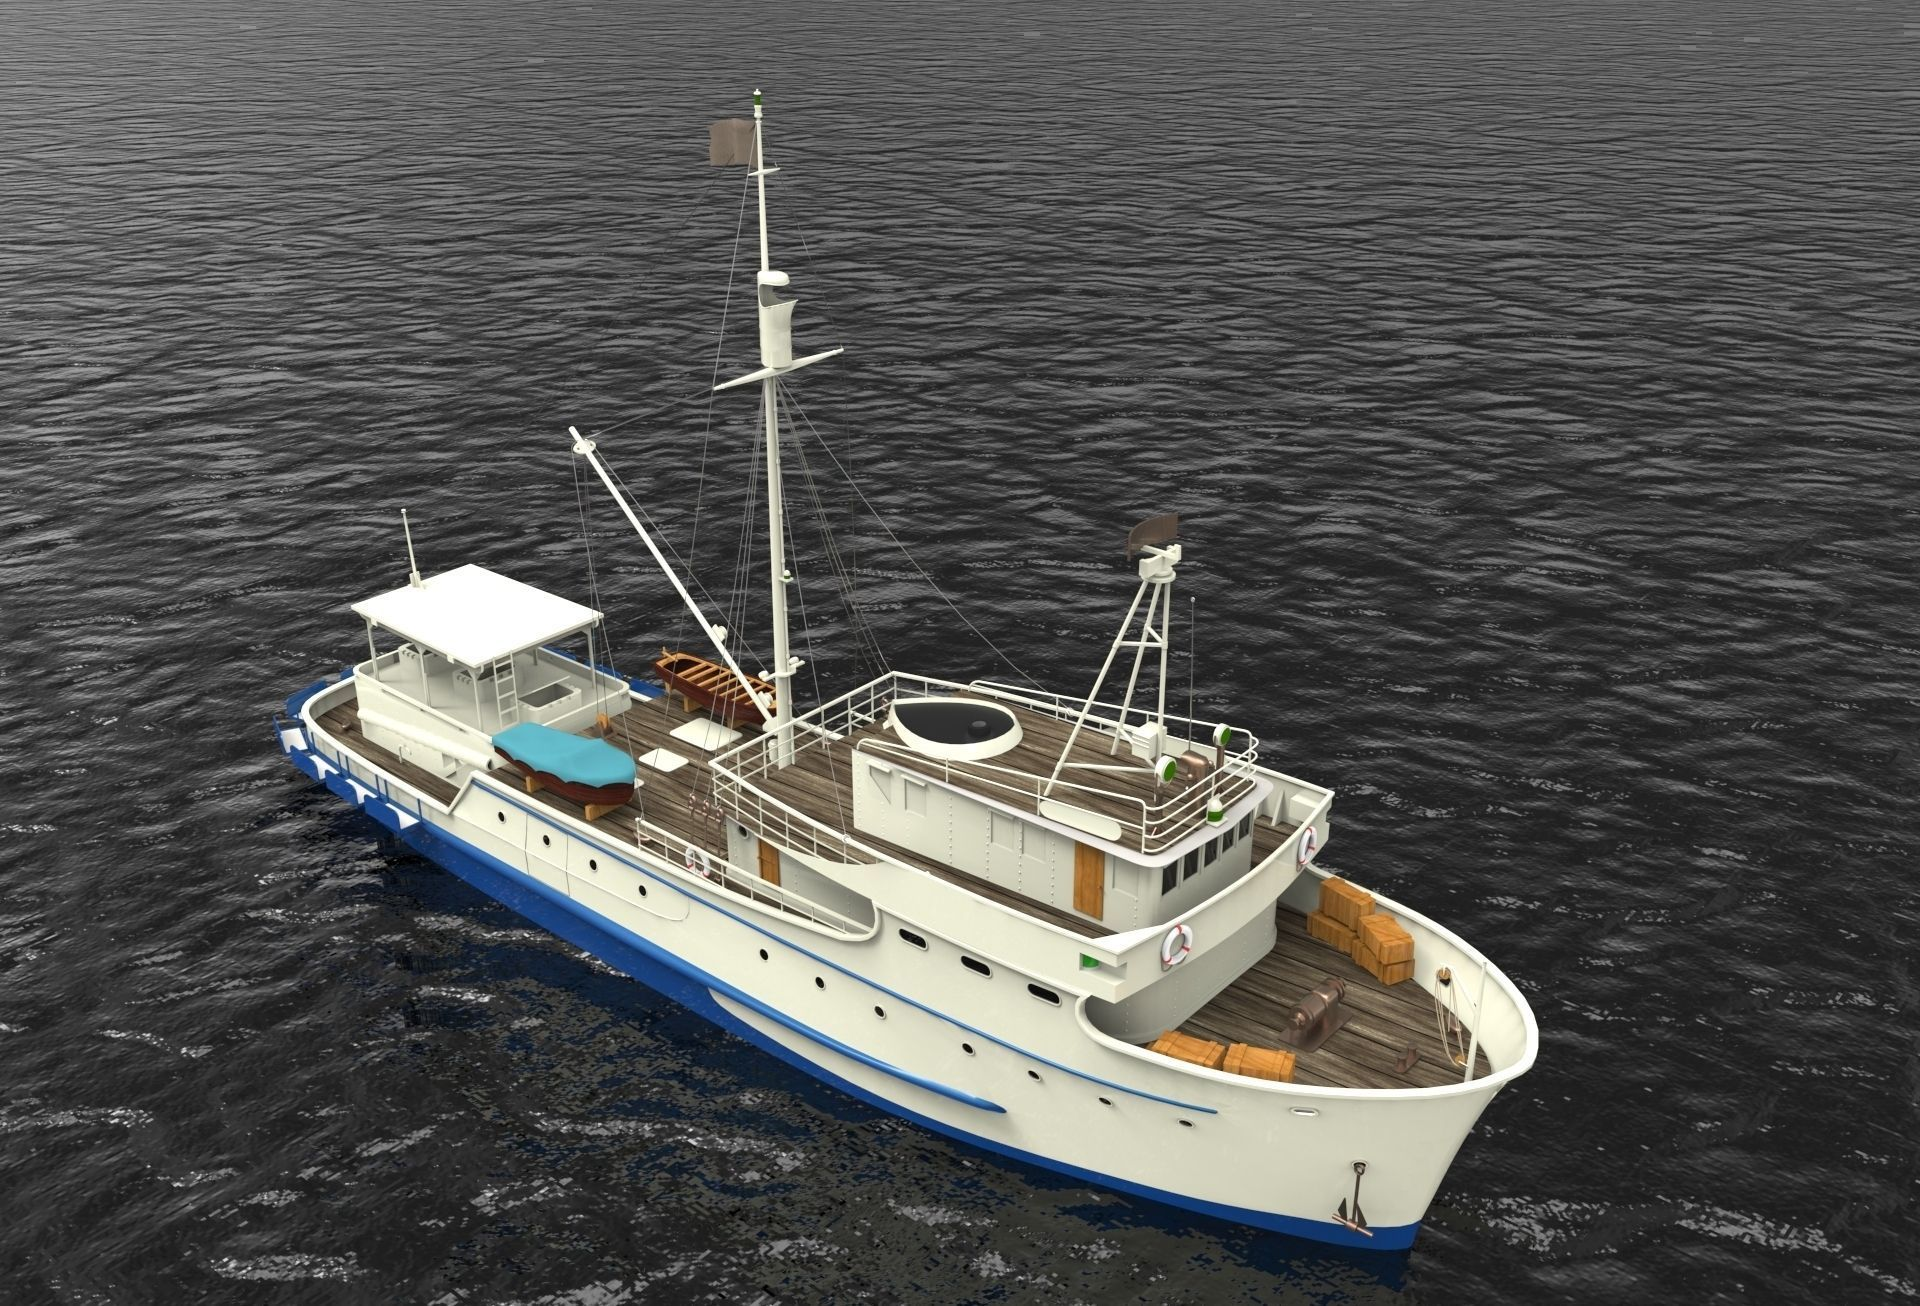 Fishing boat free 3d model 3dm for Model fishing boats